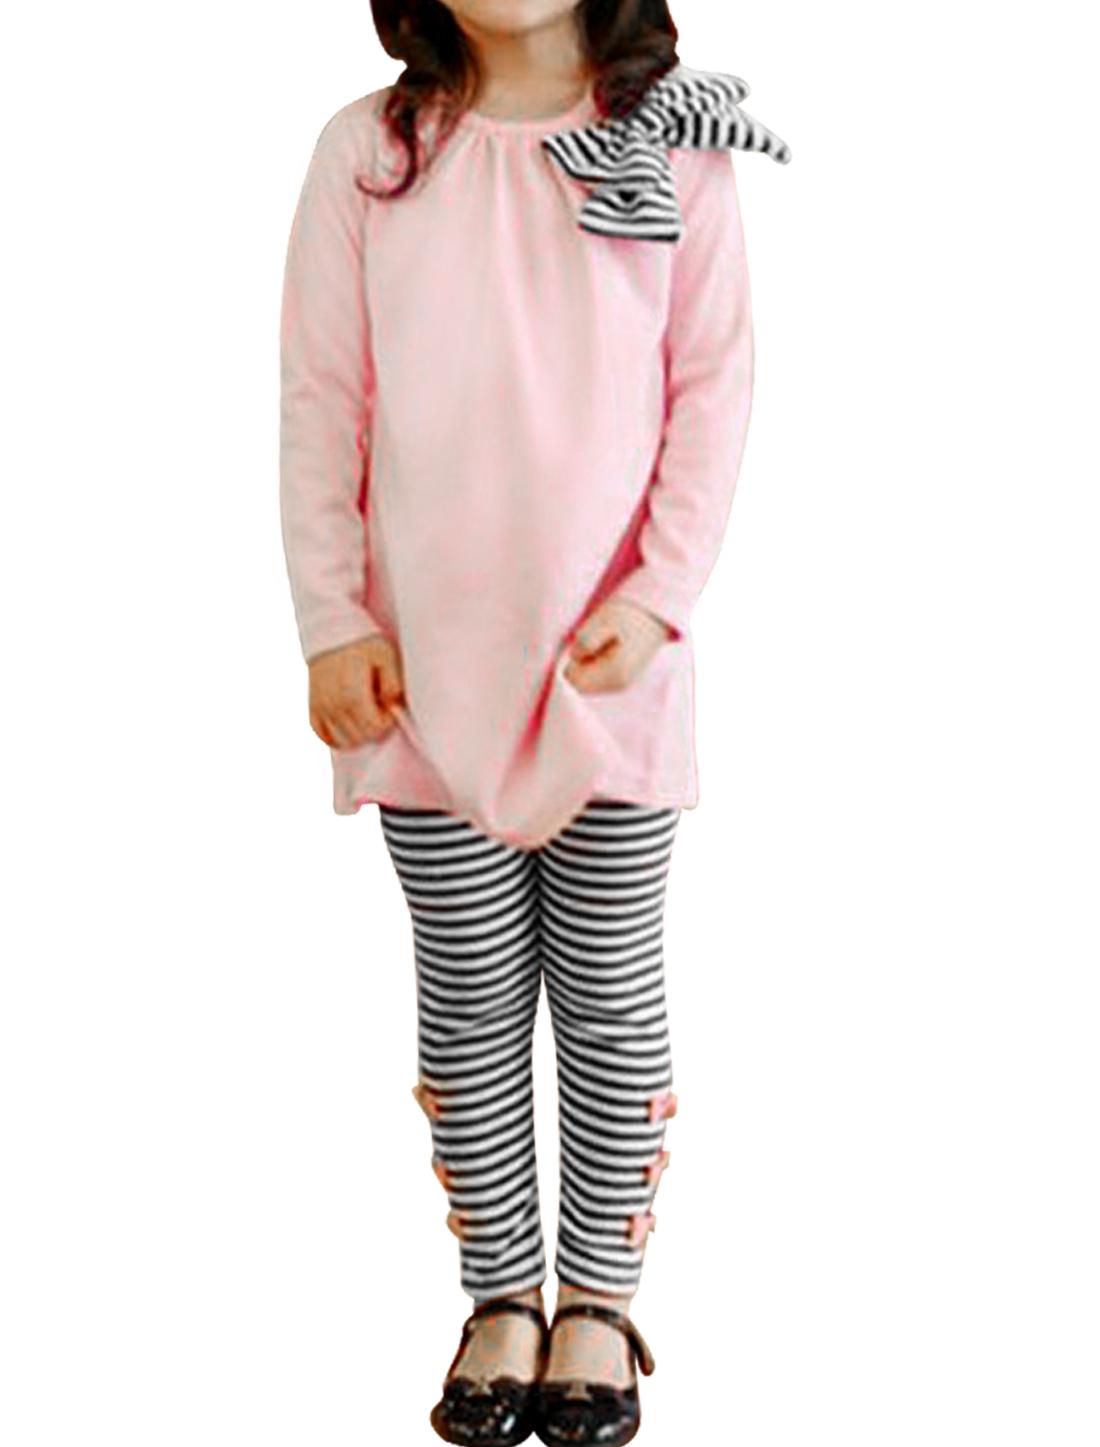 Girls Long Sleeve Stretchy Shirt & Stripes Pants Pink Black 4